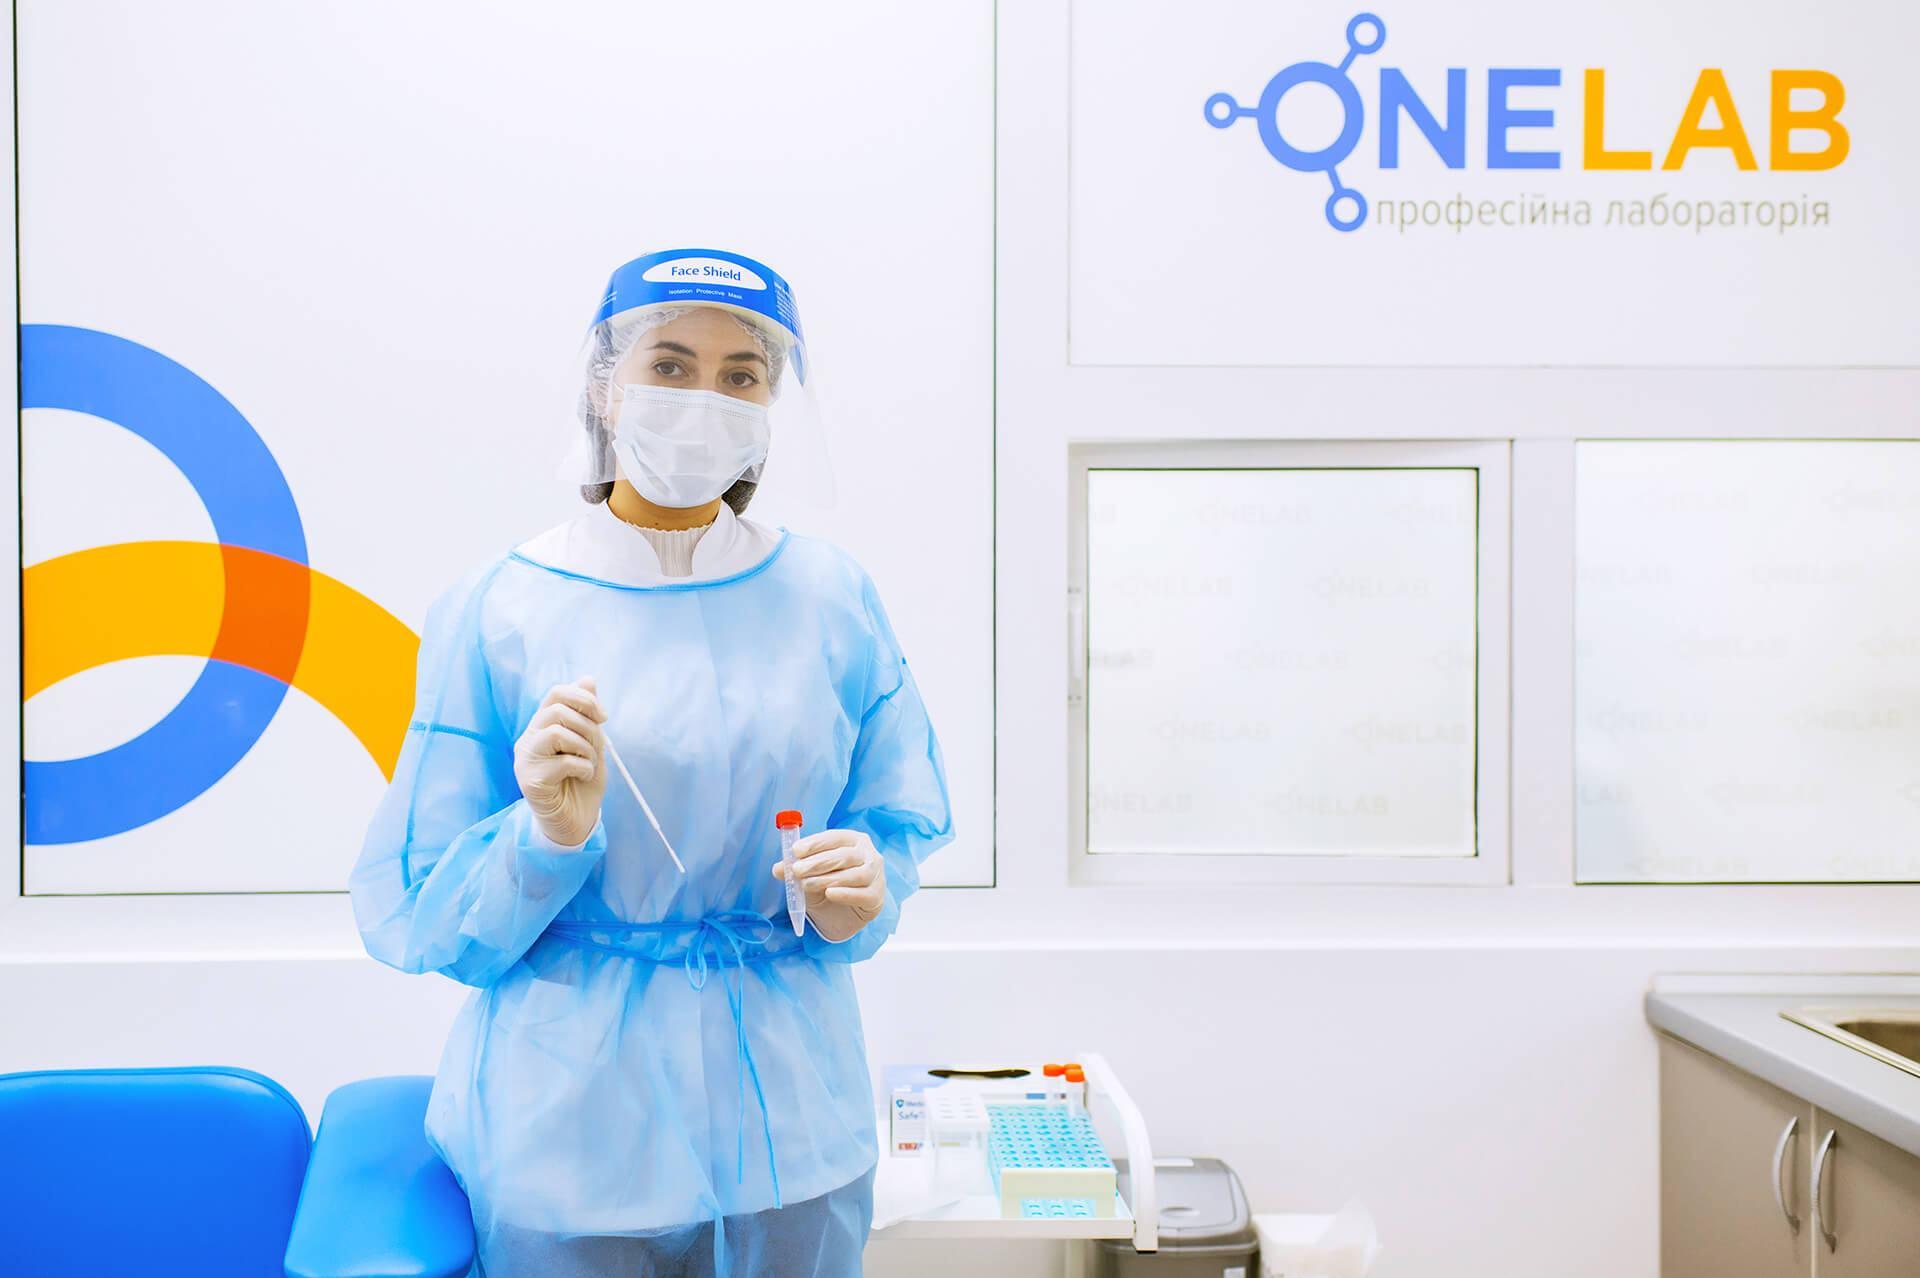 Onelabcovid 2